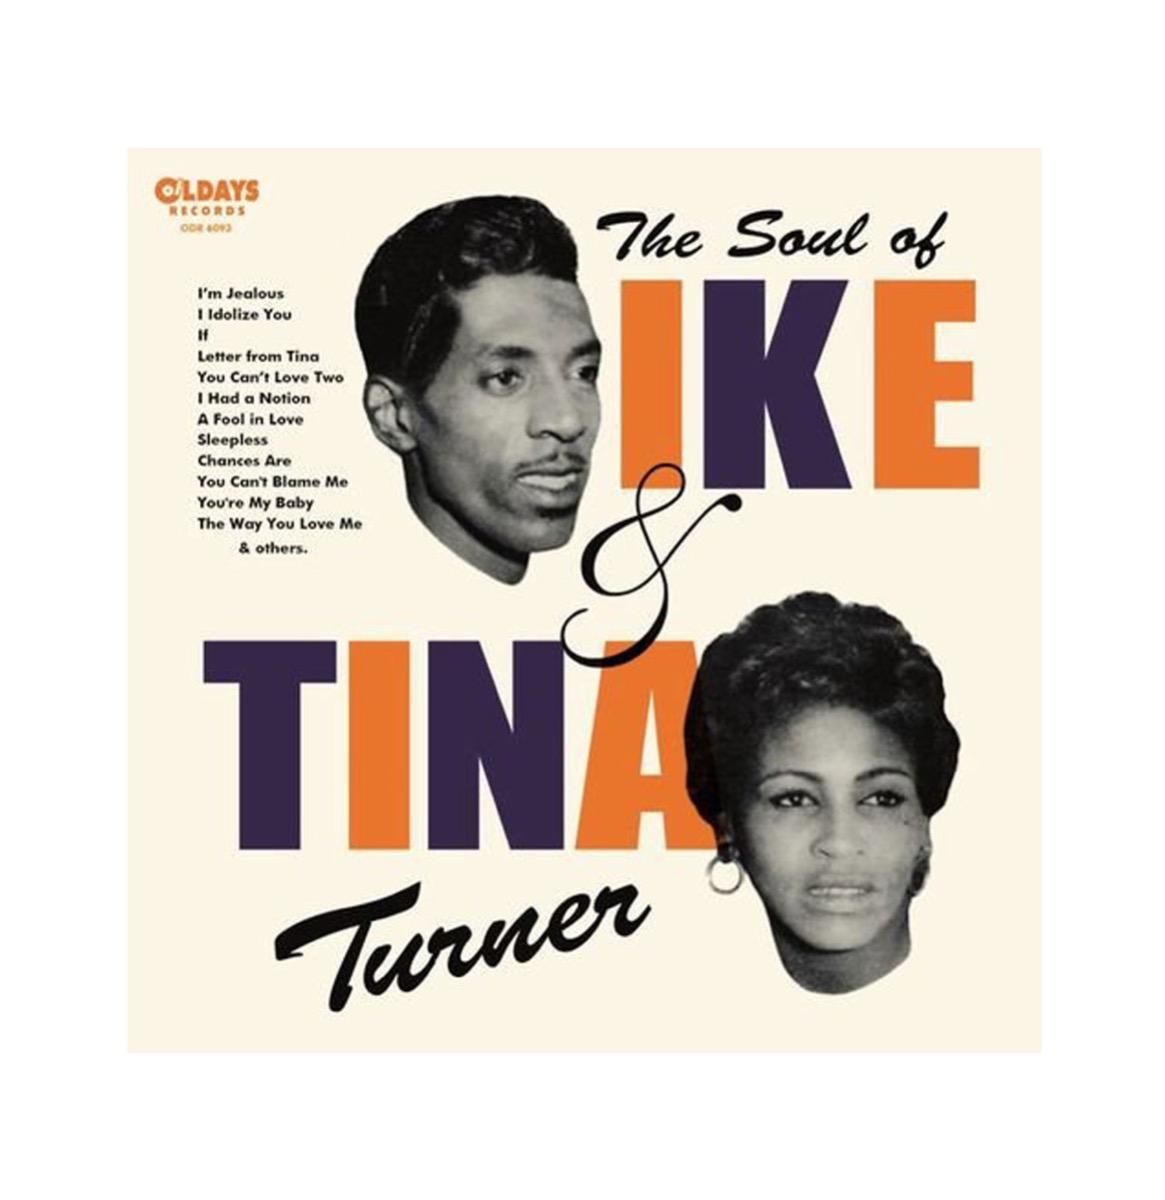 Ike & Tina Turner - The Soul of LP